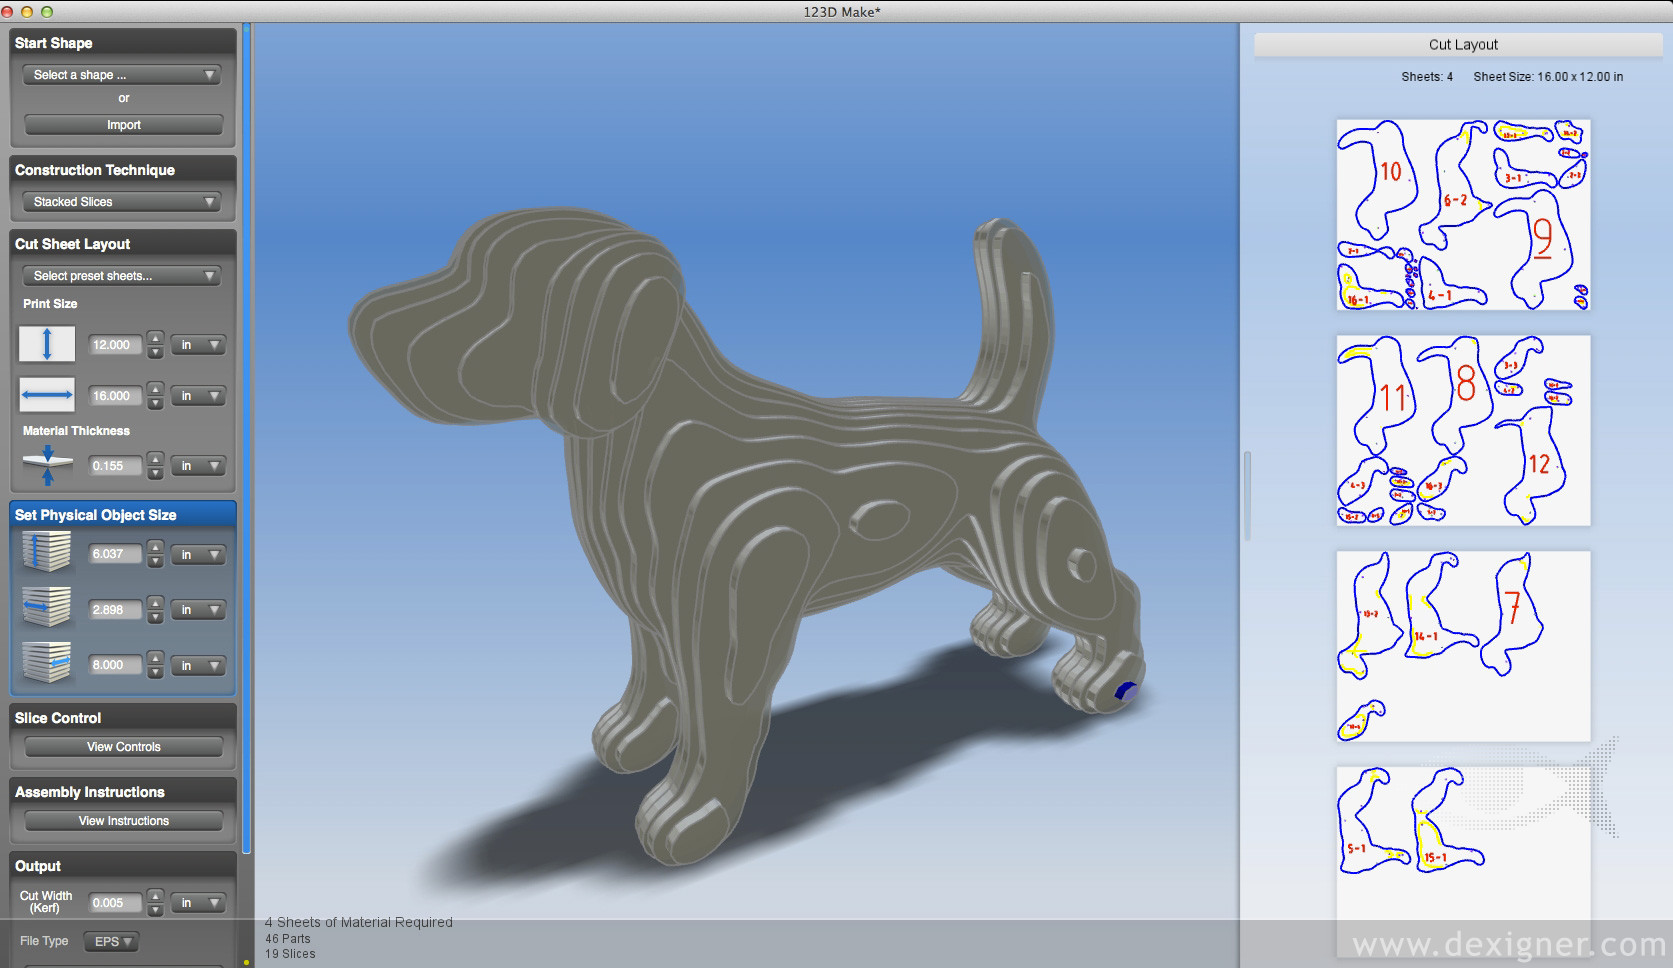 Autodesk 123D Make - Imagem 1 do software